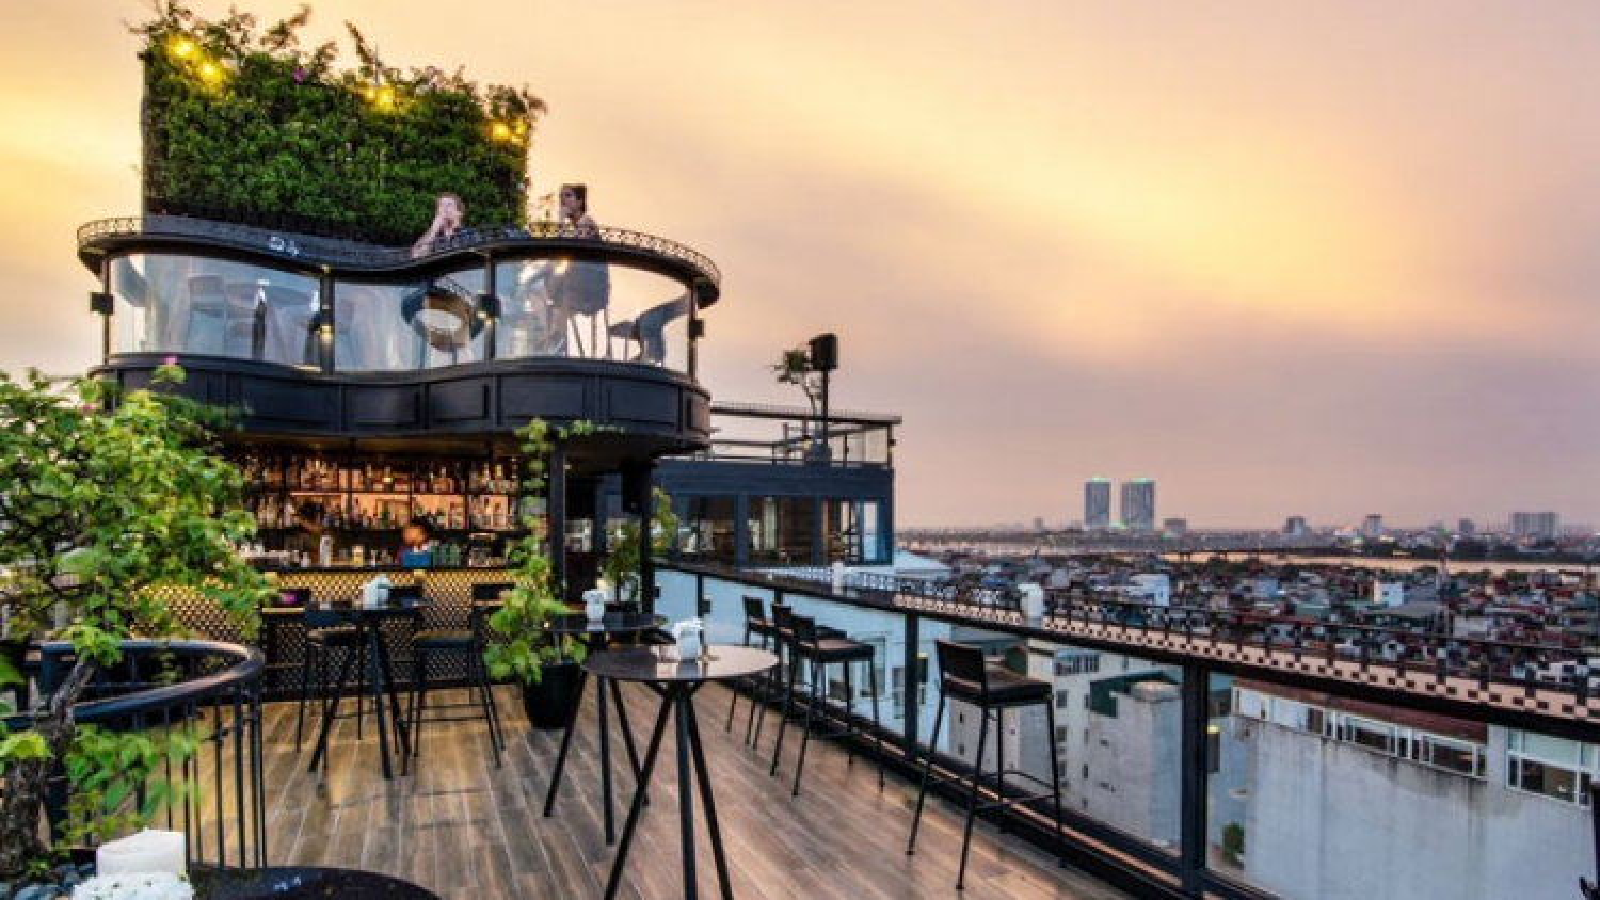 Vietnamese hotels make World's Best Rooftops for 2021 list